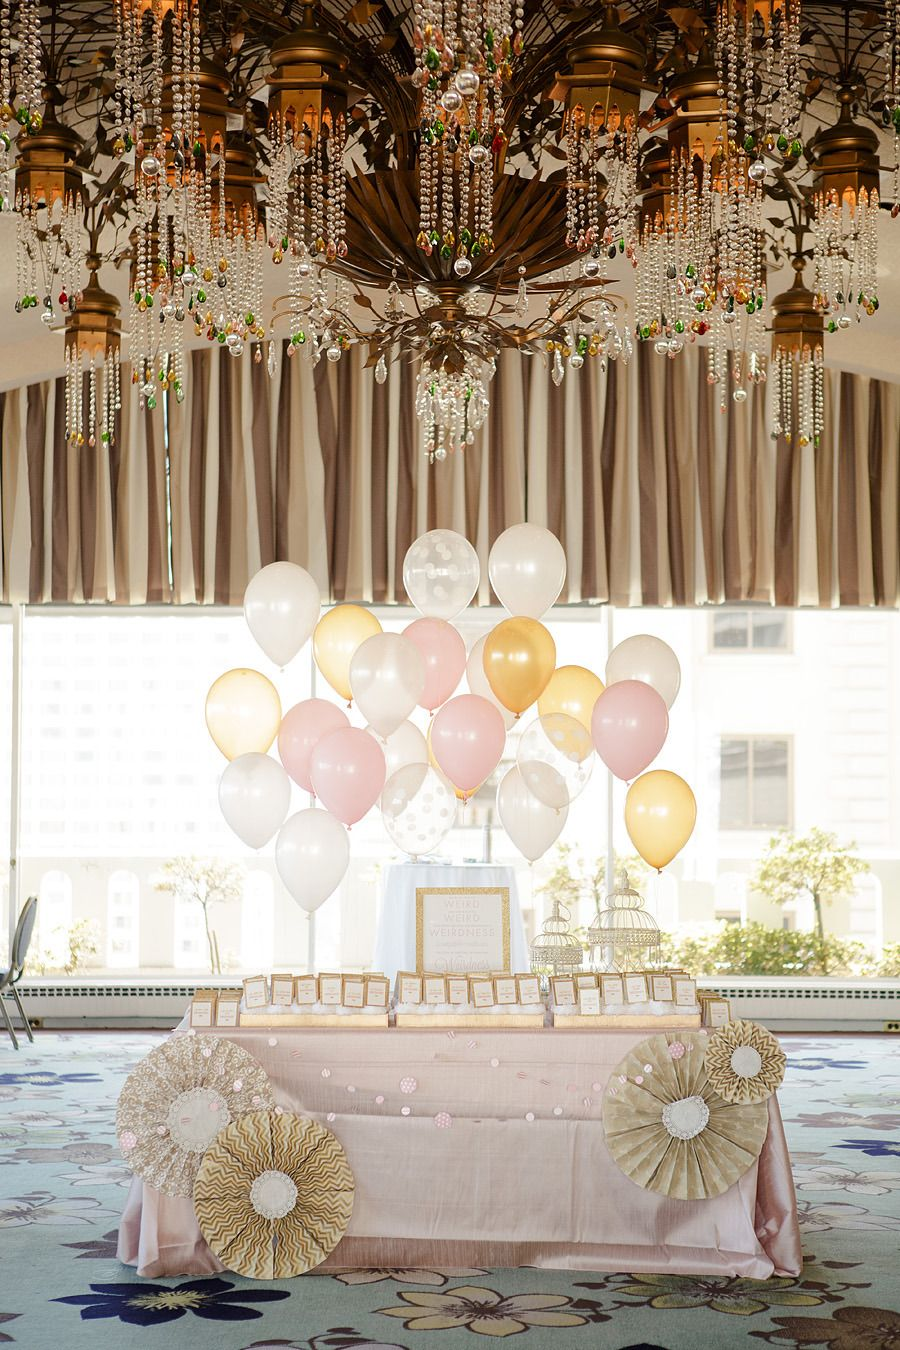 Wedding decoration ideas balloons  Whimsical and Elegant Ballroom Wedding at Fairmont San Francisco